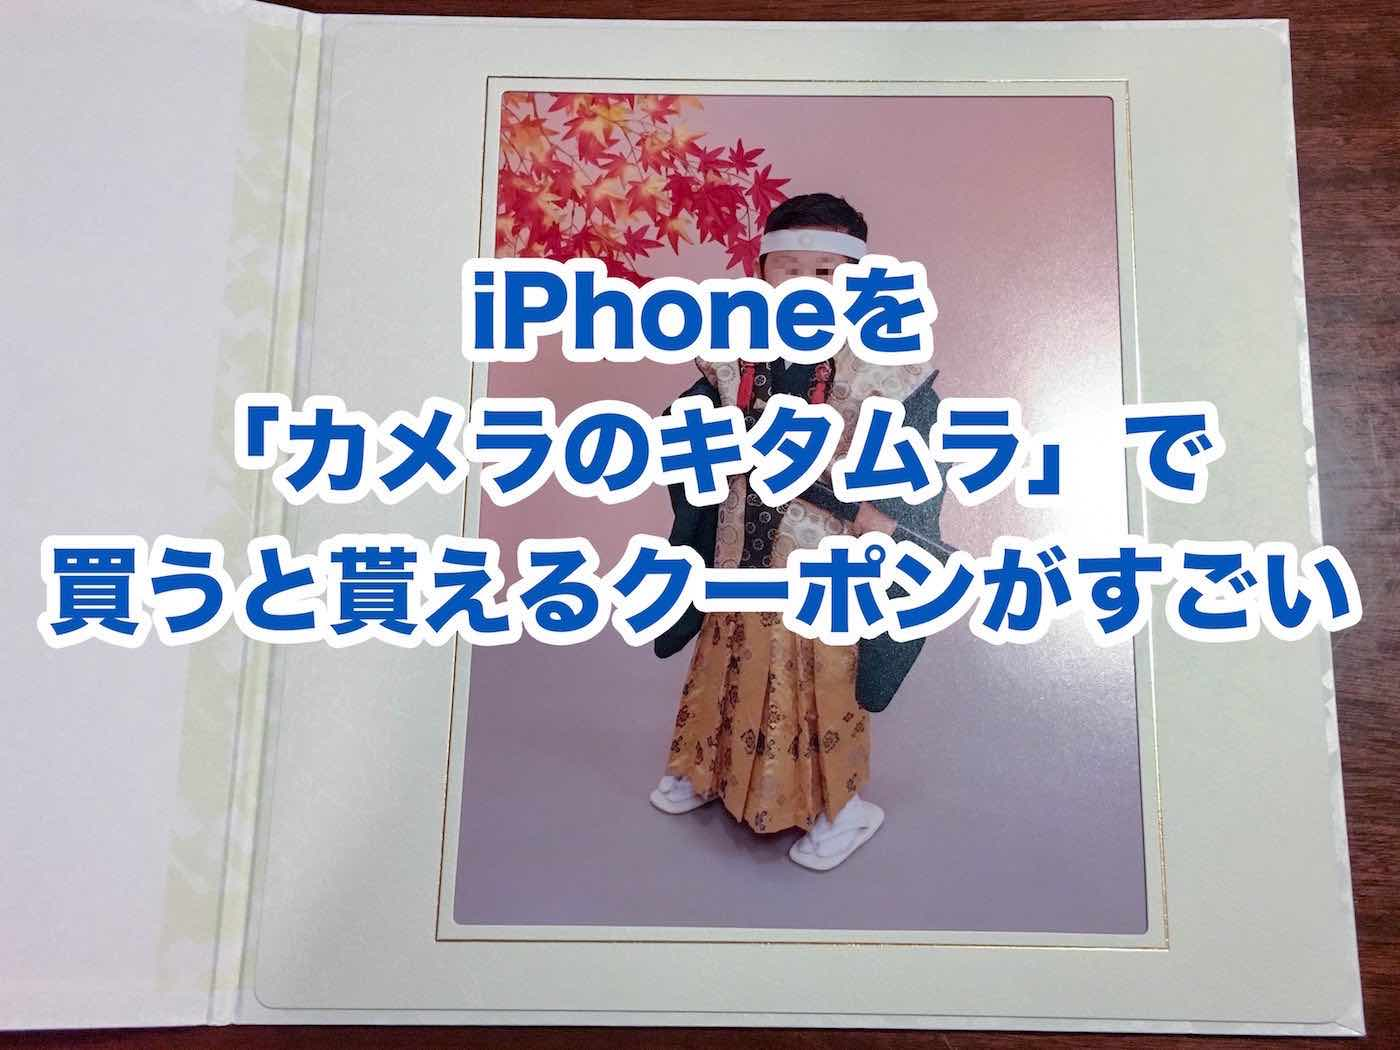 iPhoneを「カメラのキタムラ」で買うと貰えるクーポンがすごい